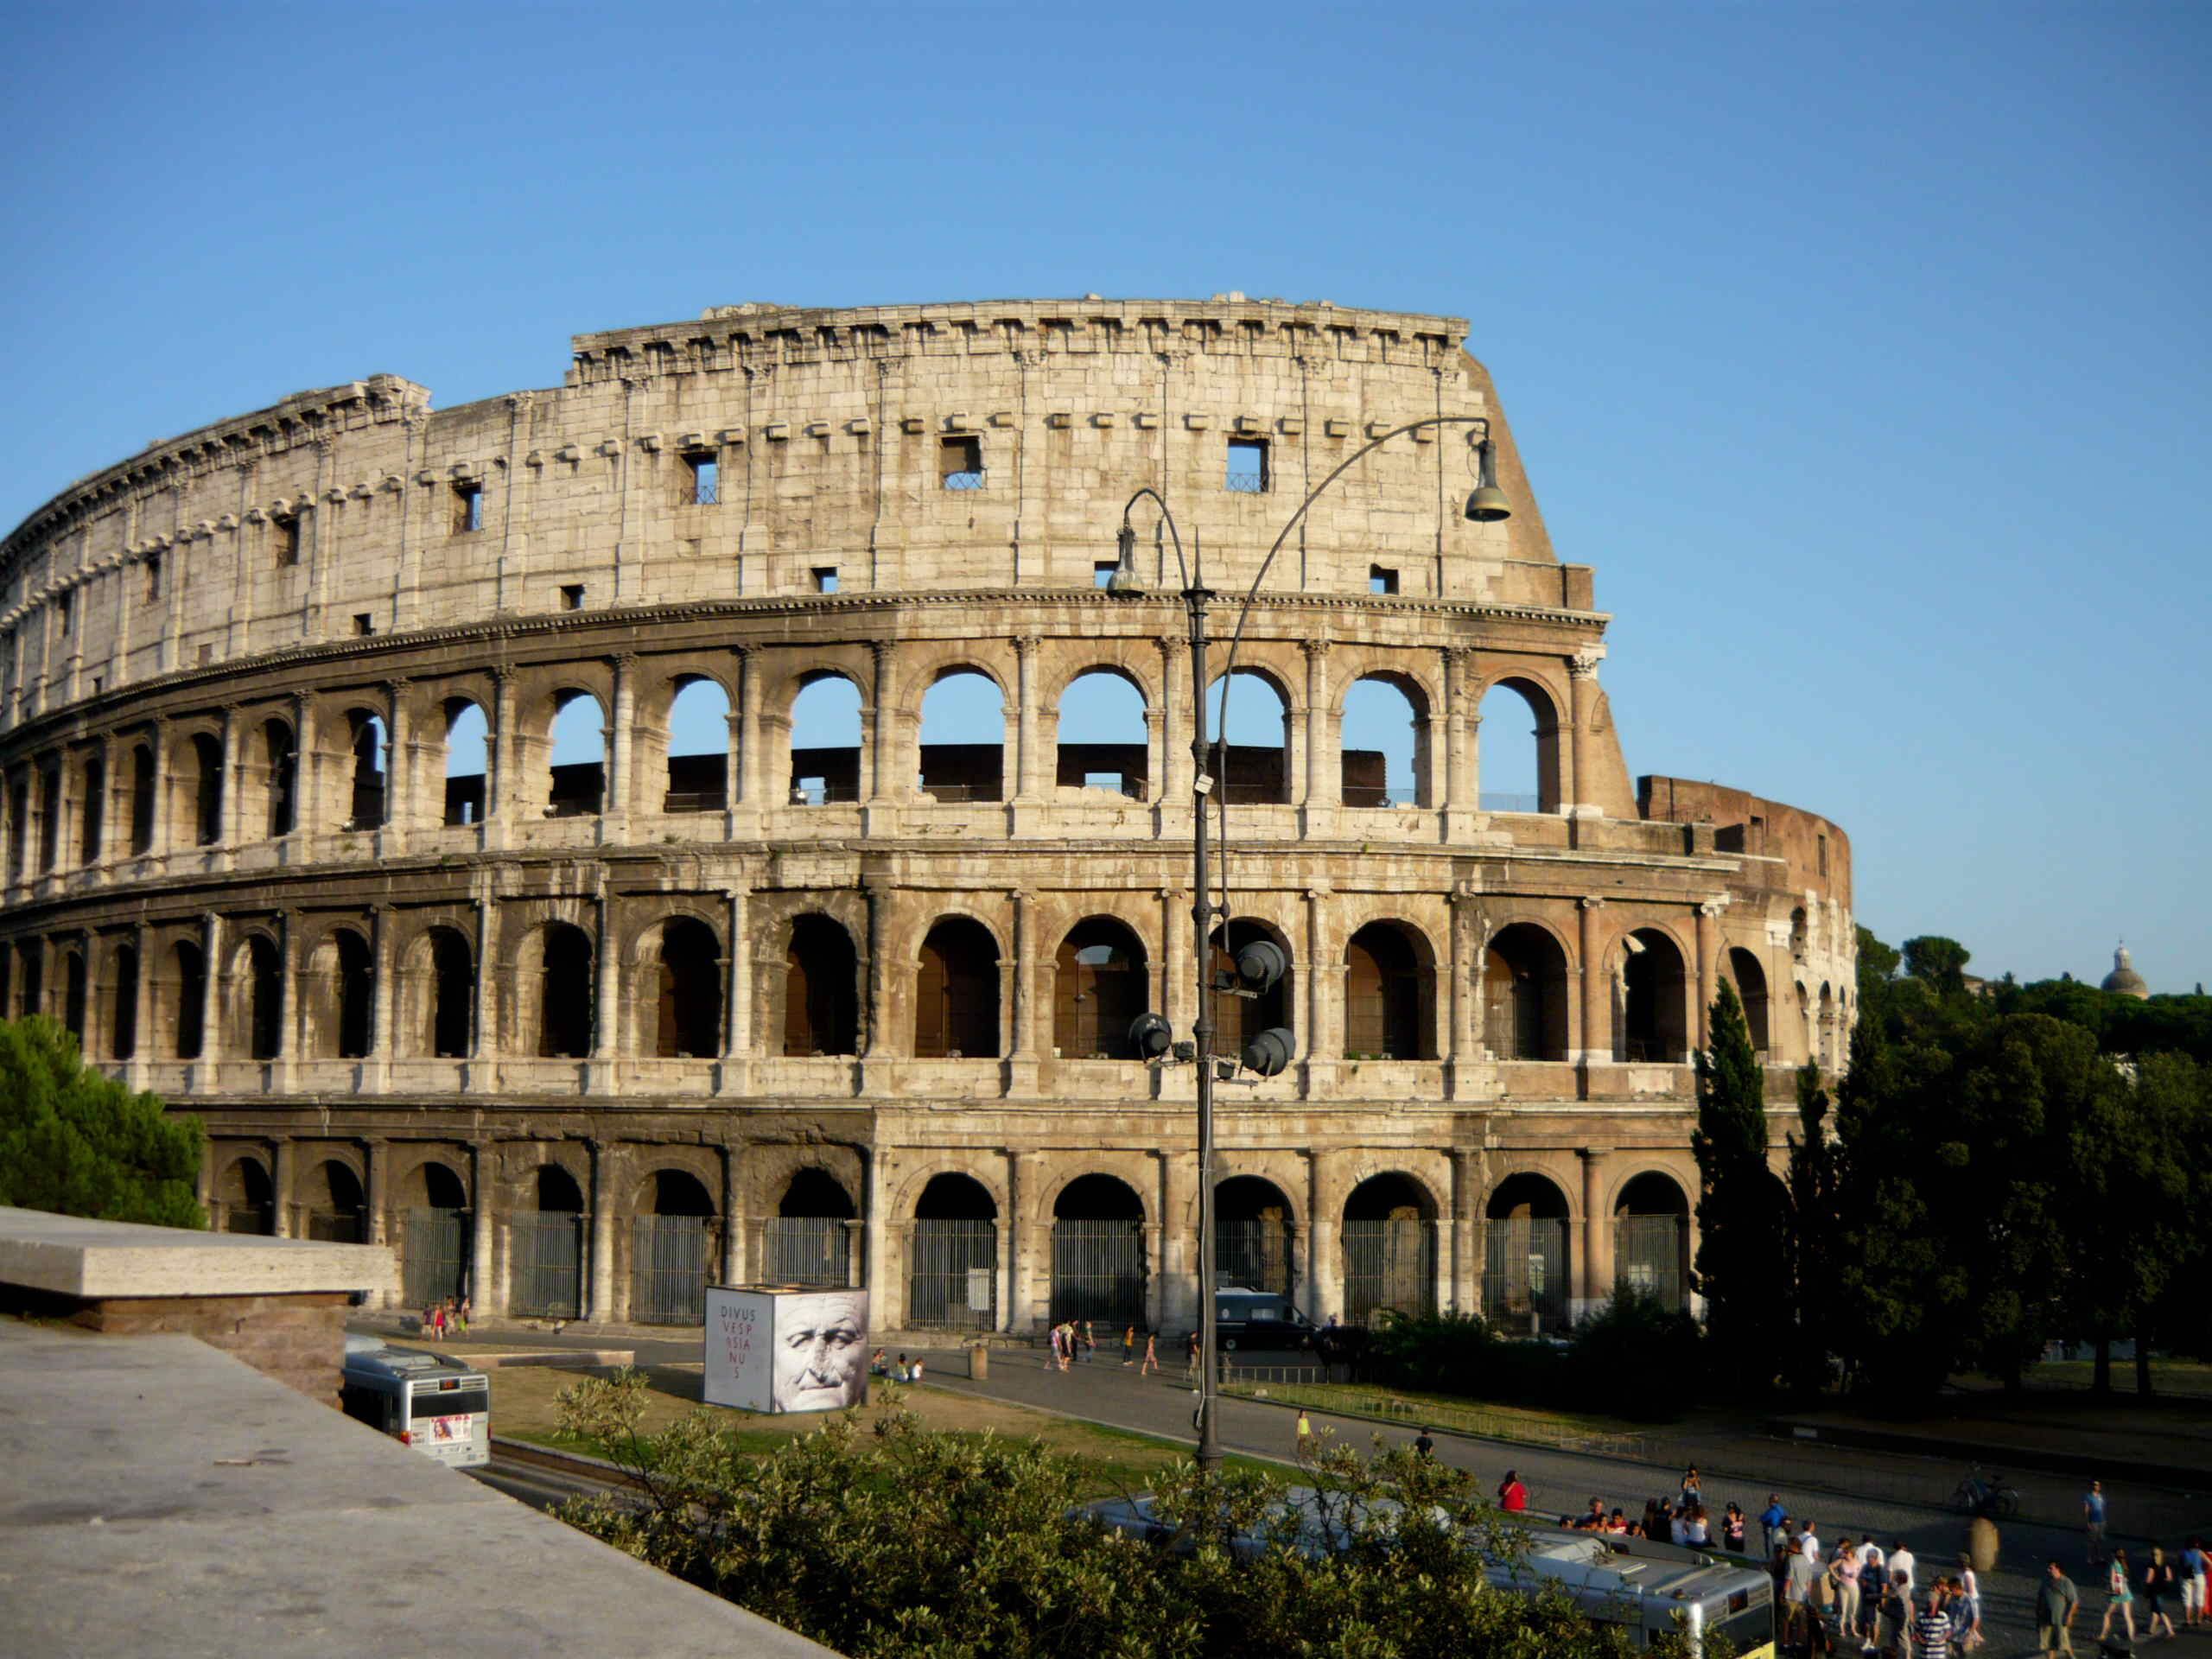 roma - photo #47